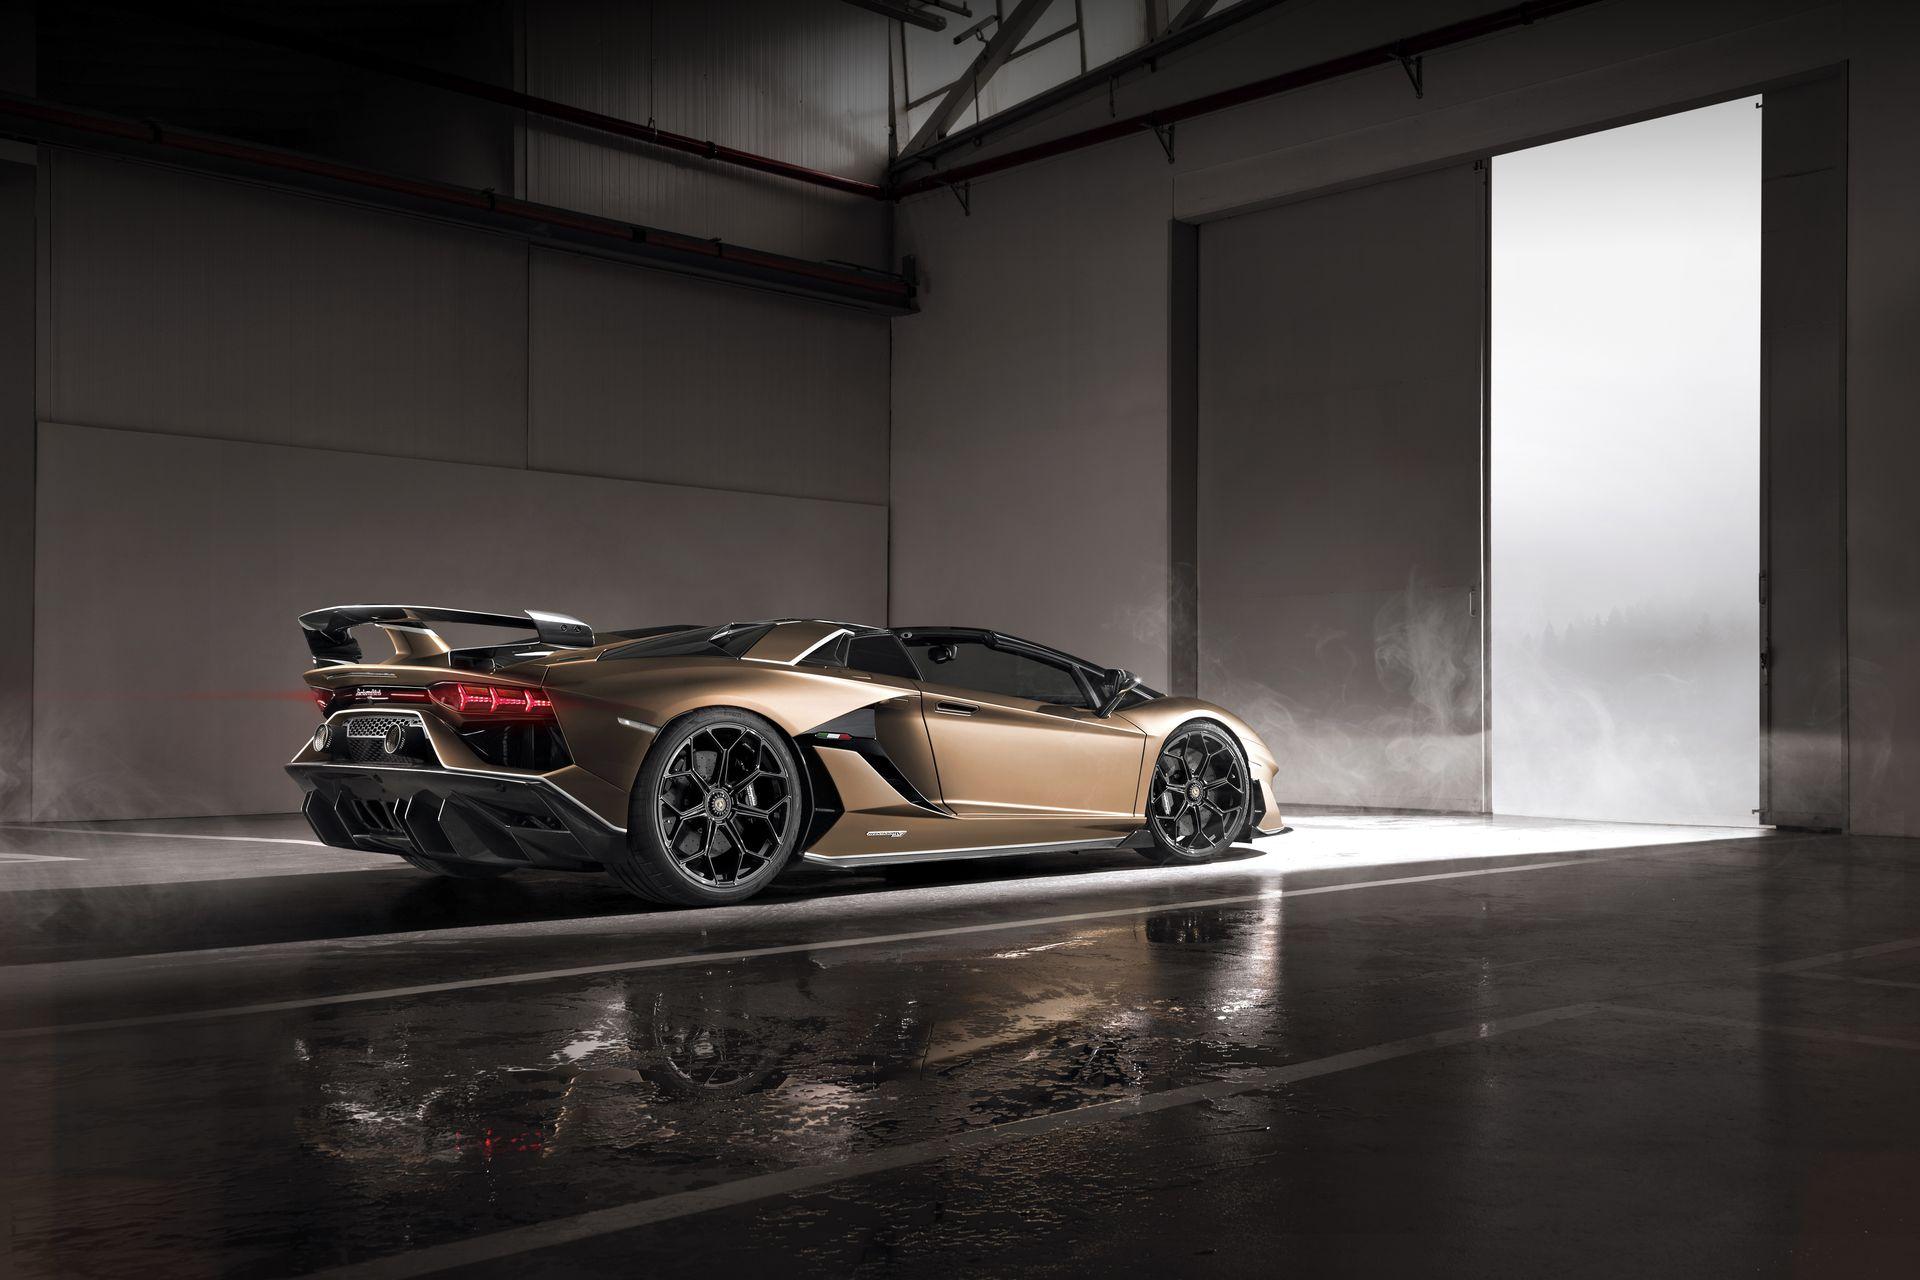 Lamborghini Aventador Svj Roadster 6